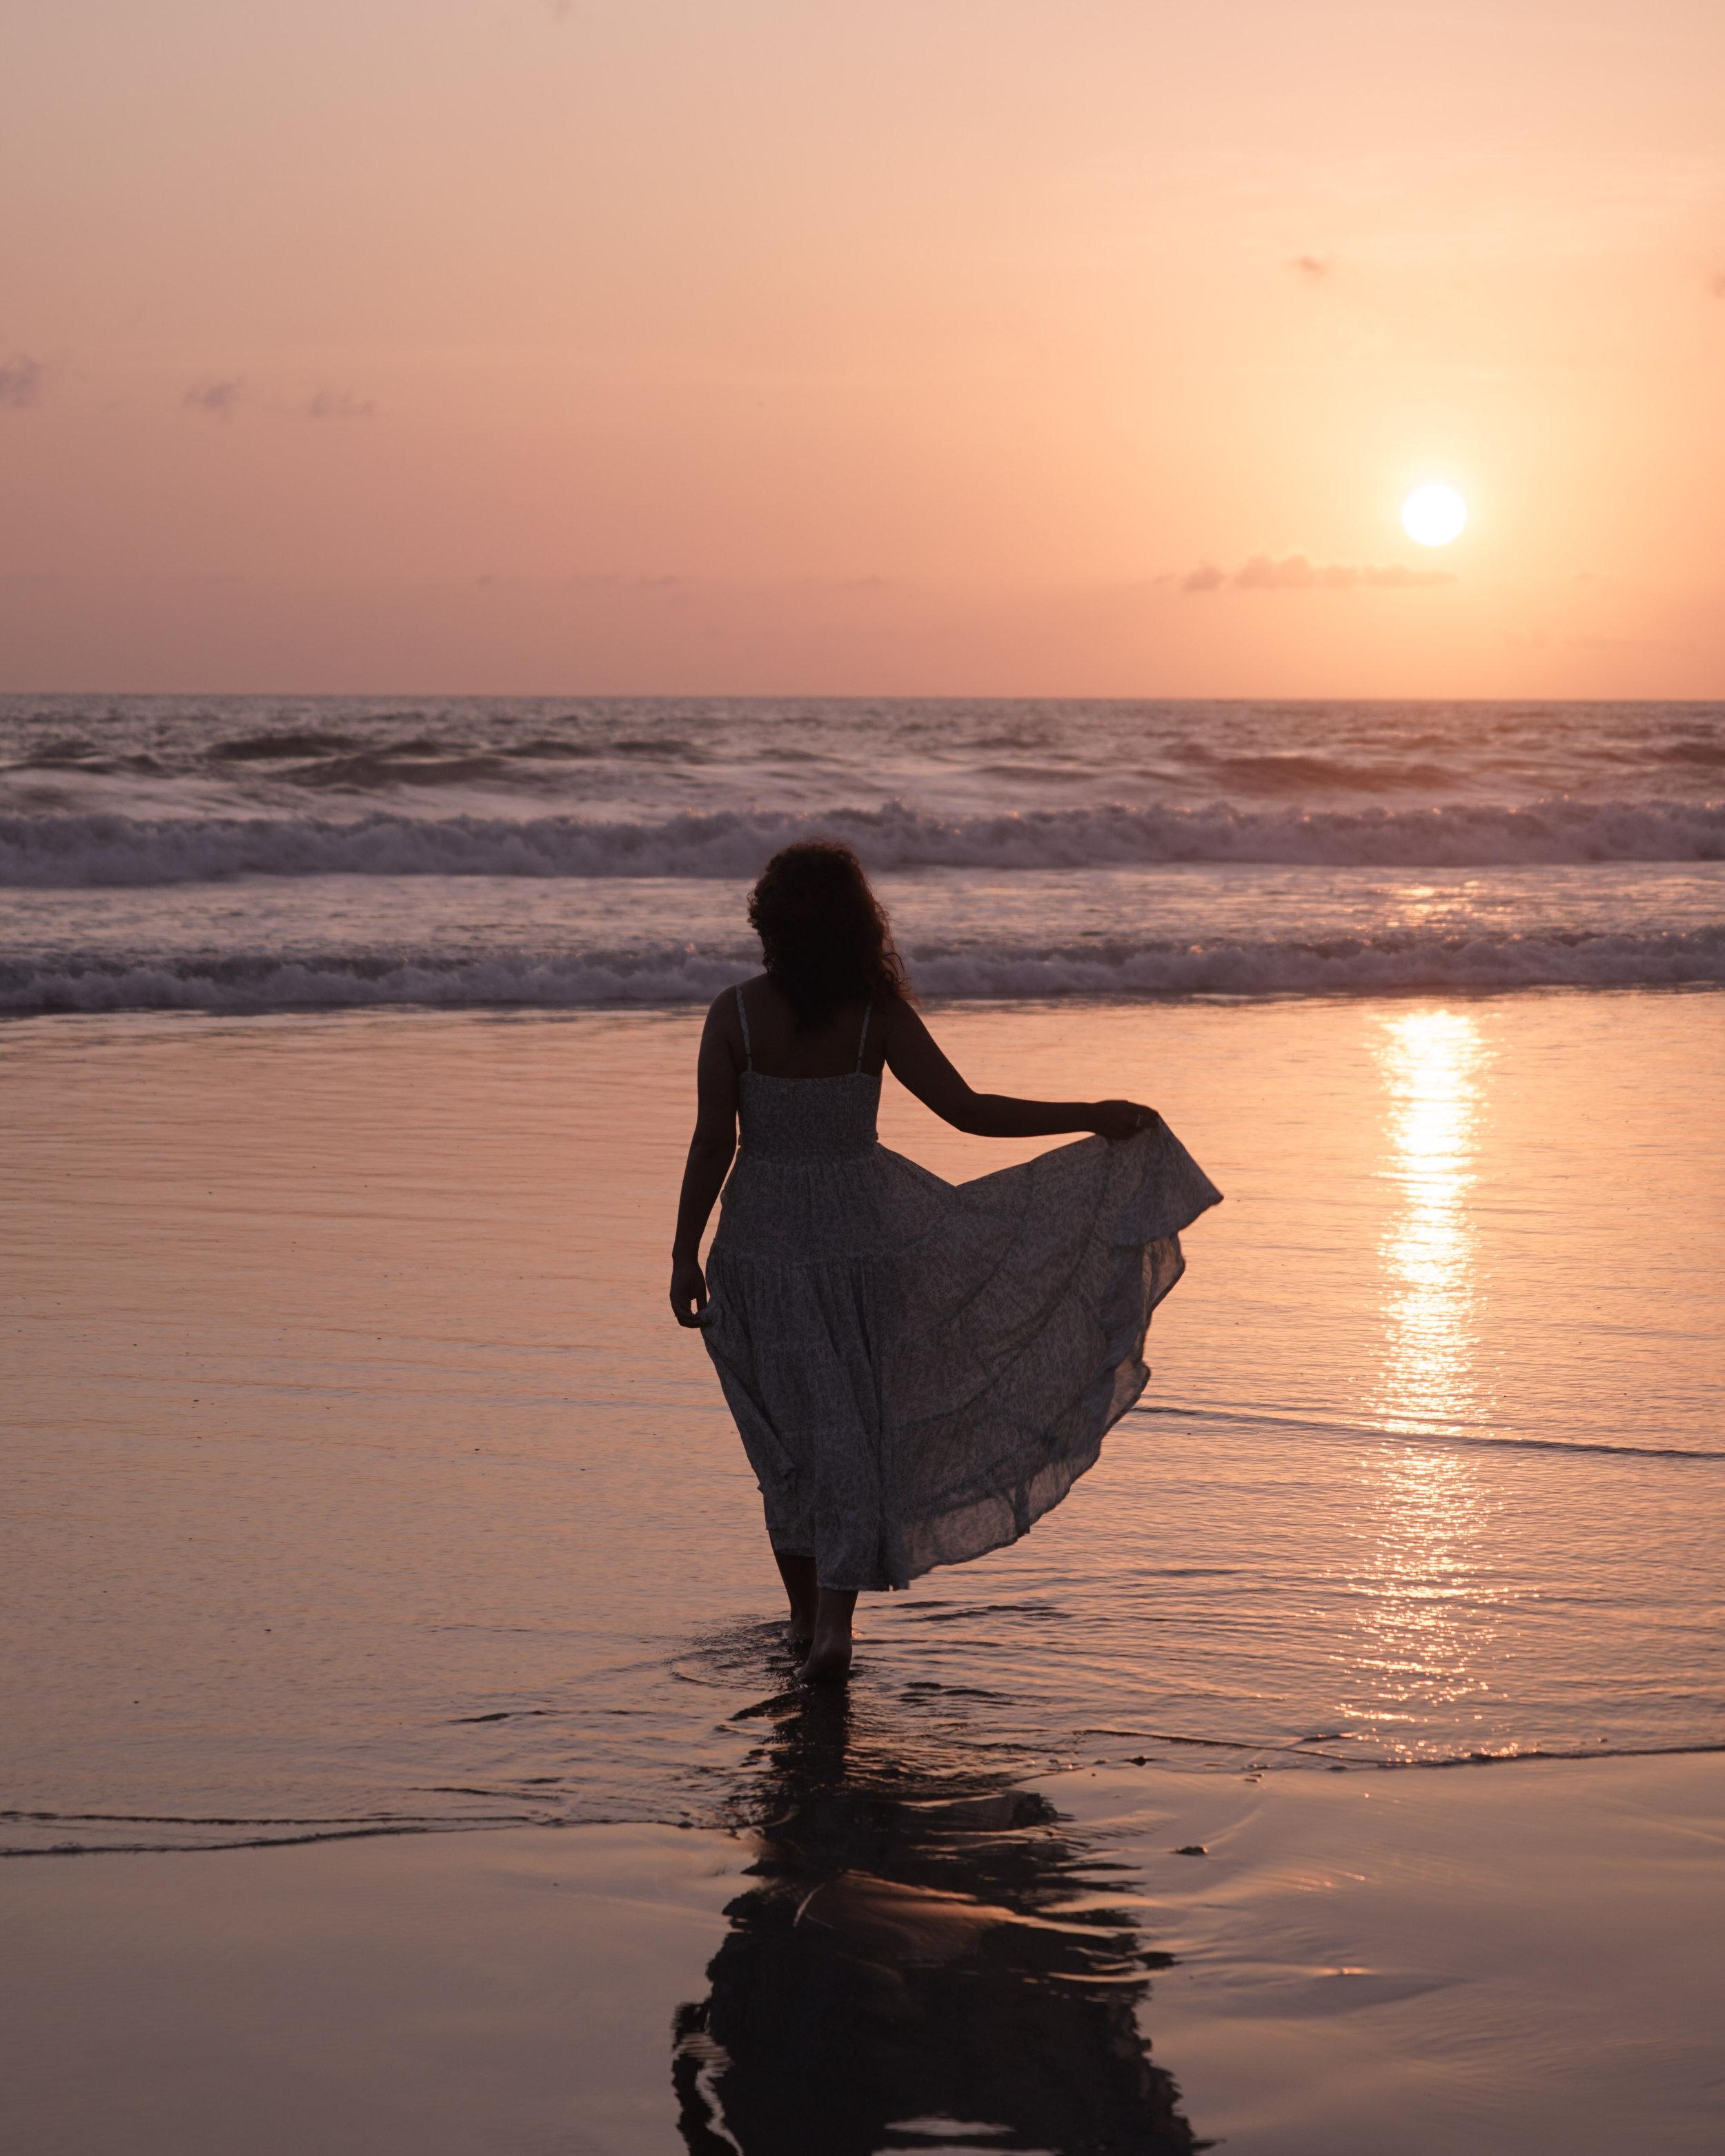 Jasmine Marilyn midi in Sage  from Beachgold  Photographer: @michaelwilliamlester